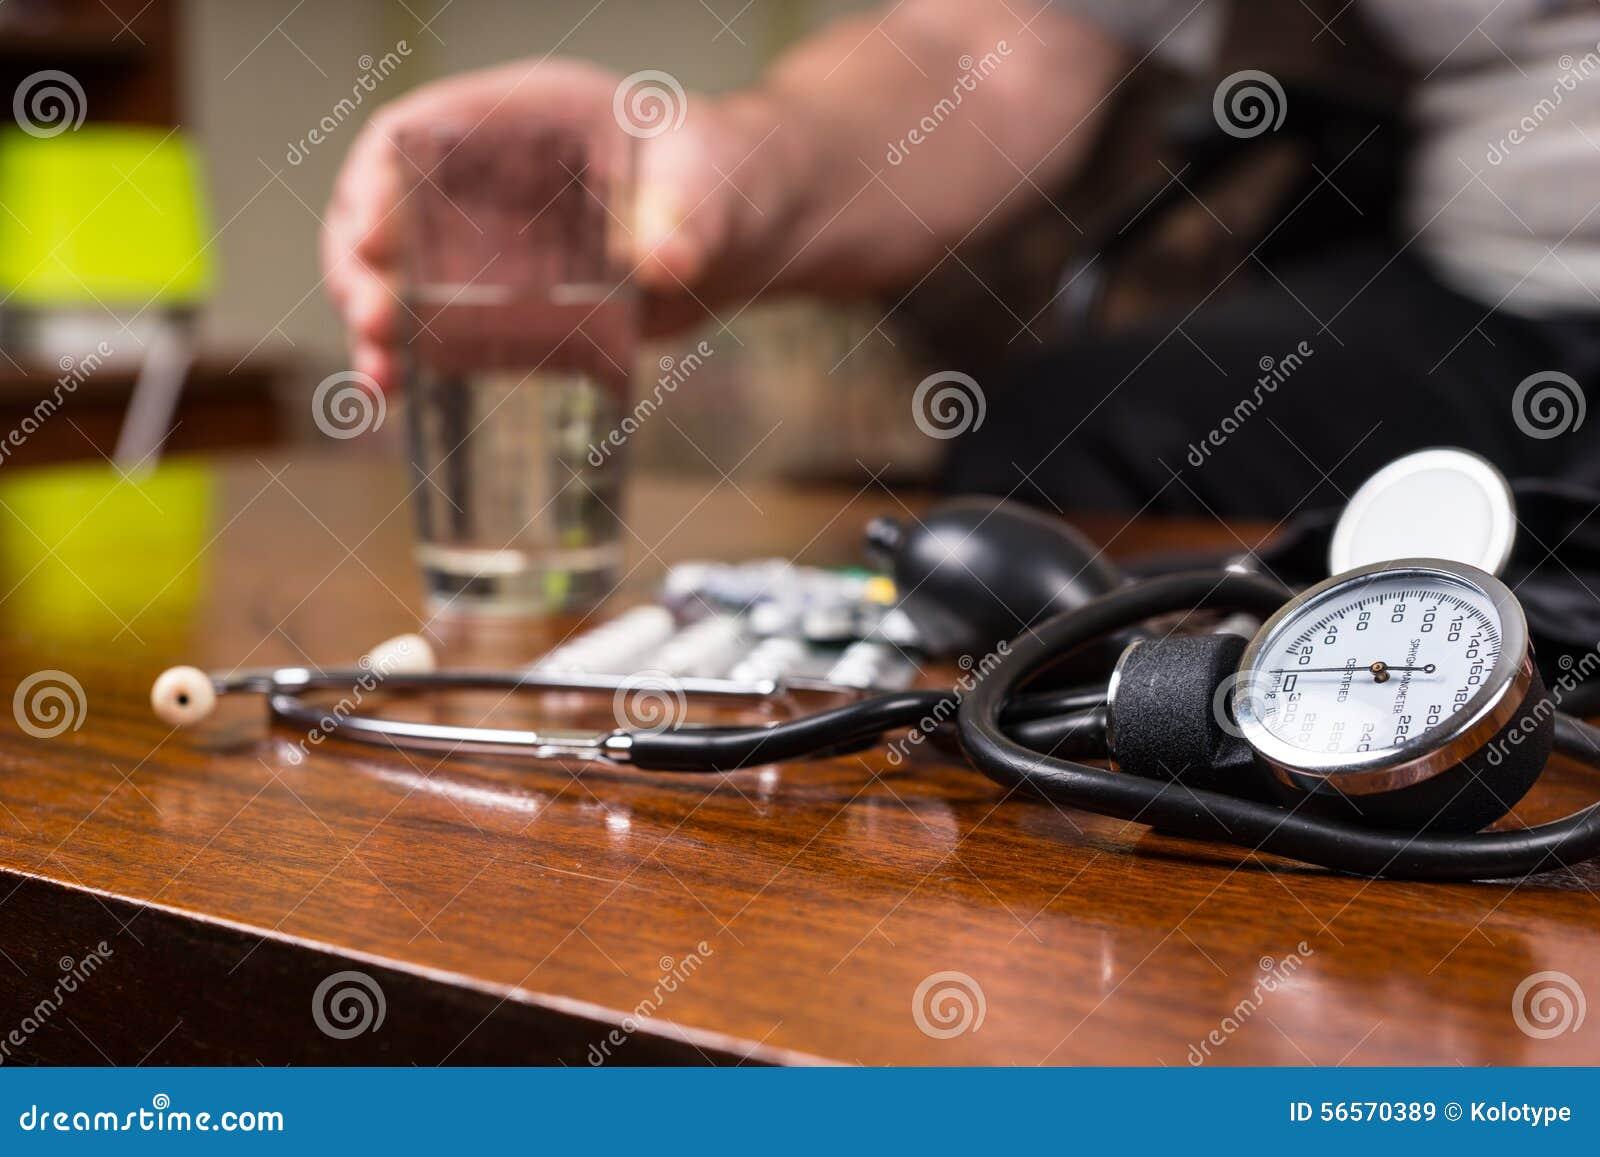 Download Συσκευές της BP στον πίνακα με τα φάρμακα και το νερό Στοκ Εικόνα - εικόνα από κυκλοφοριακός, διαφορετικός: 56570389